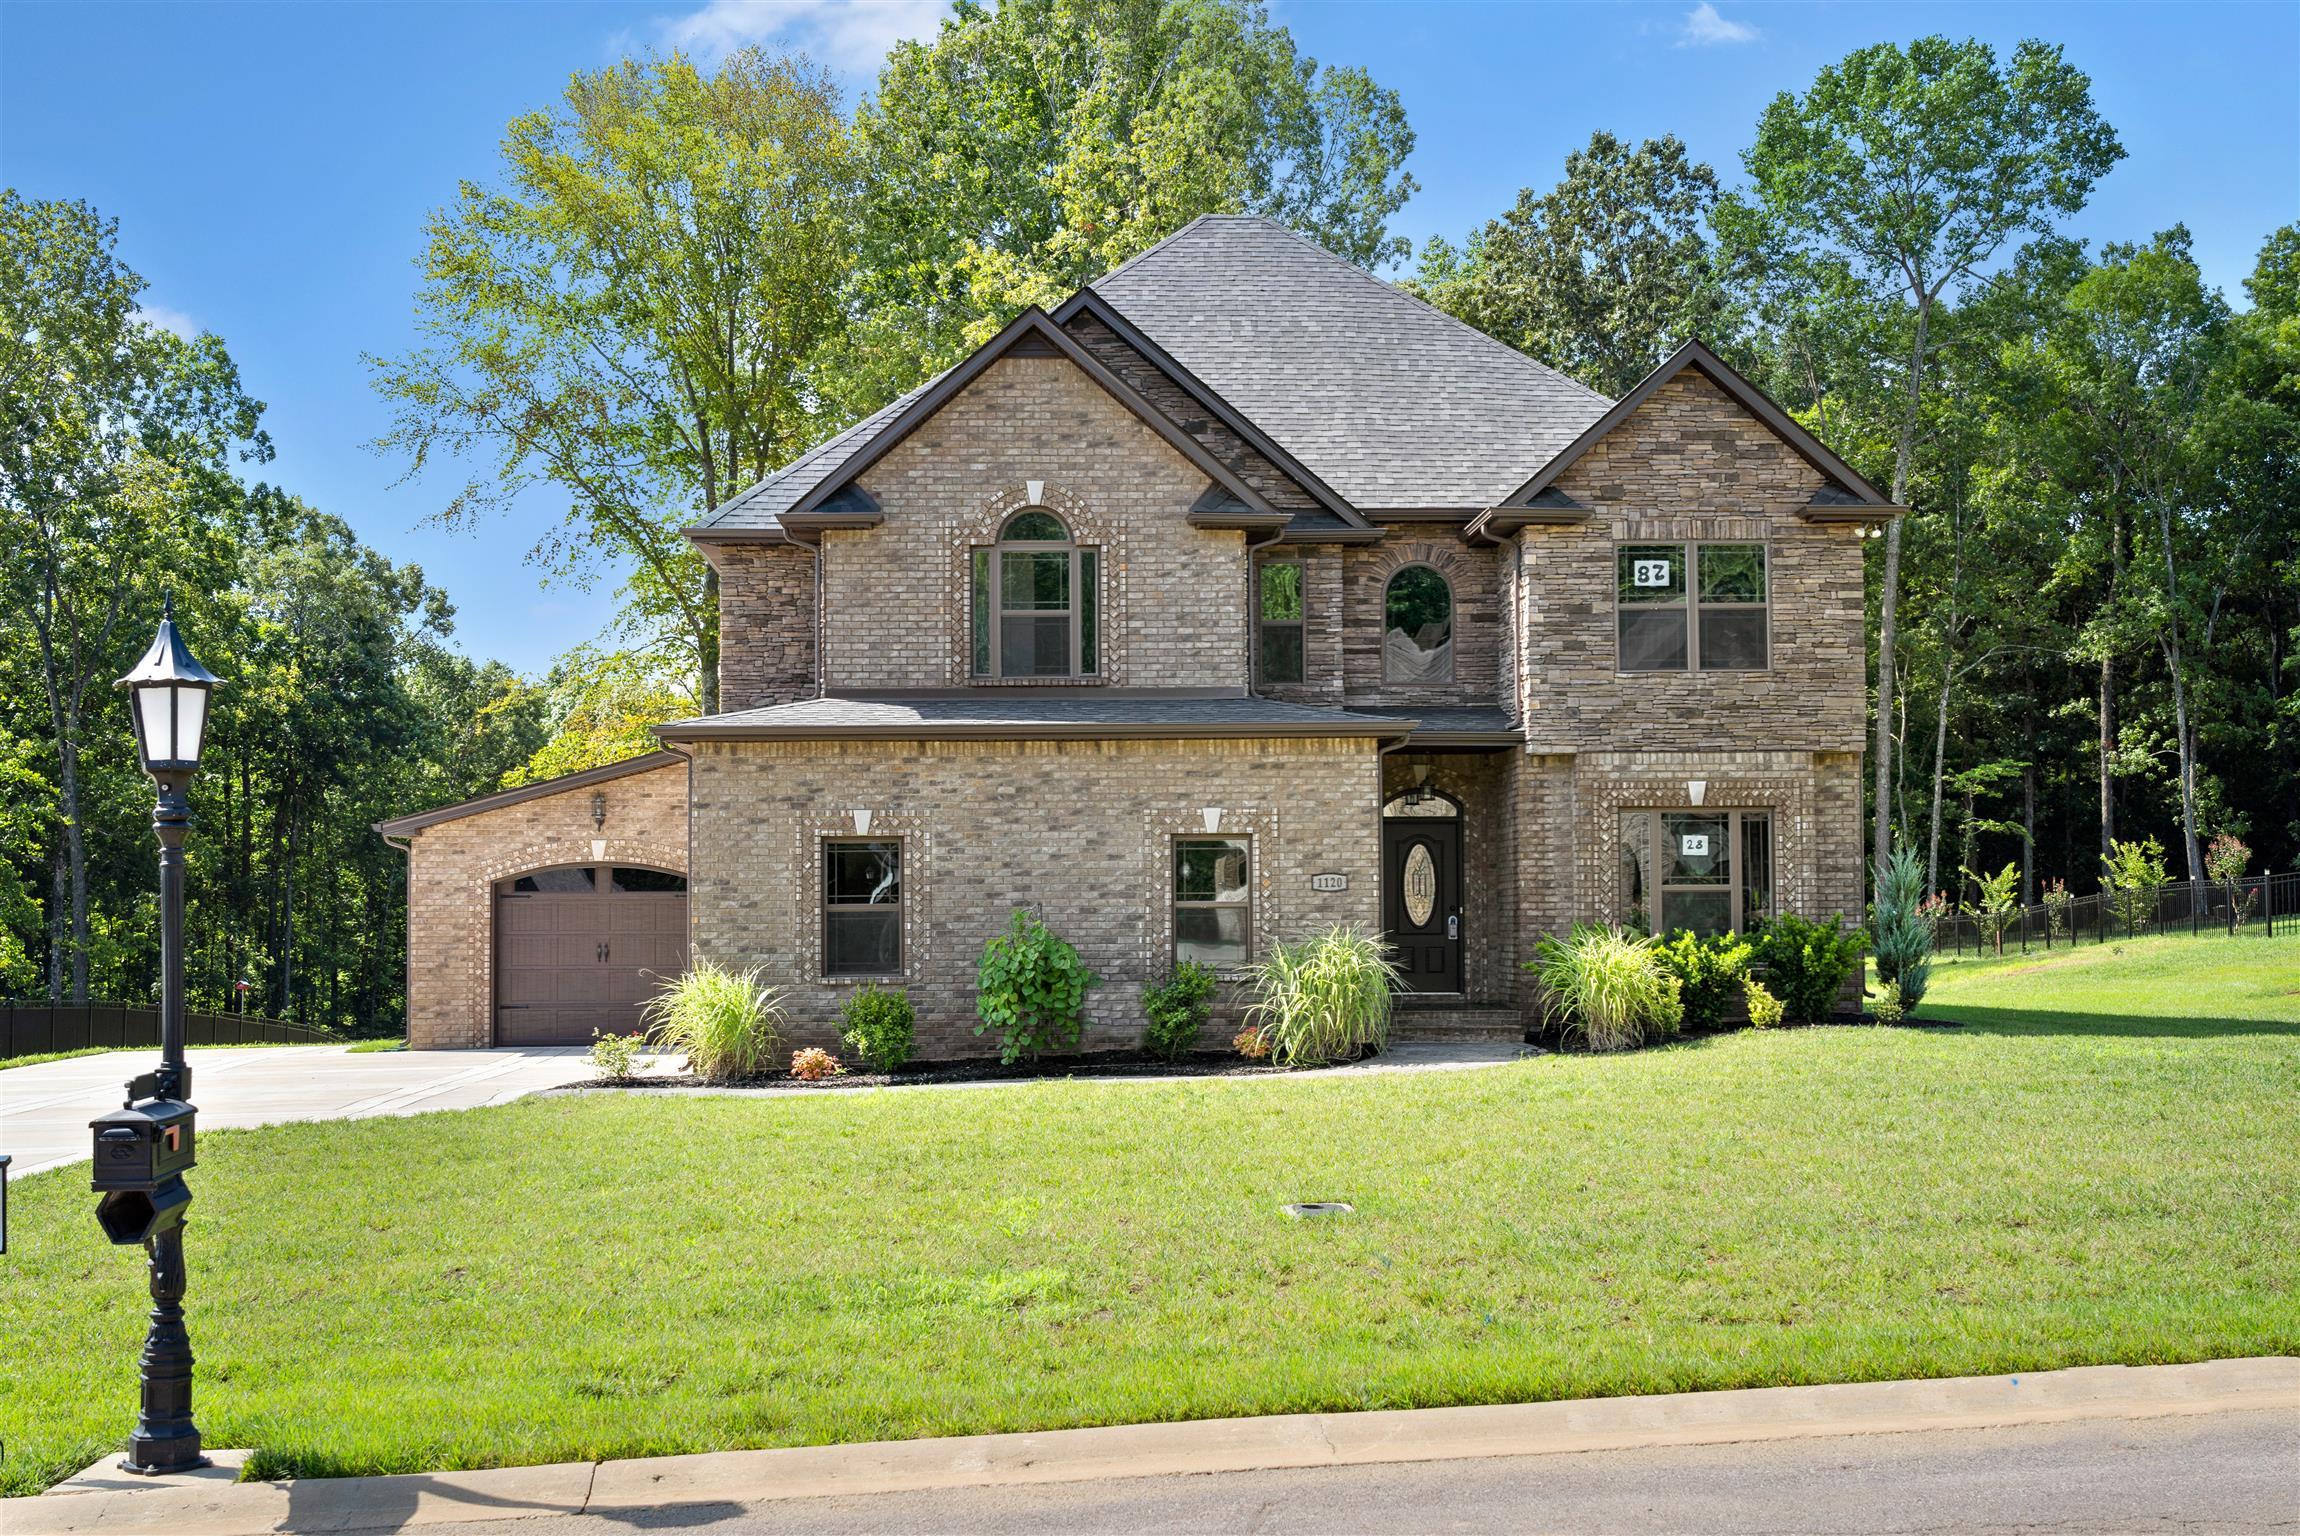 1120 Reda Drive Lot 28, Clarksville, TN 37042 - Clarksville, TN real estate listing